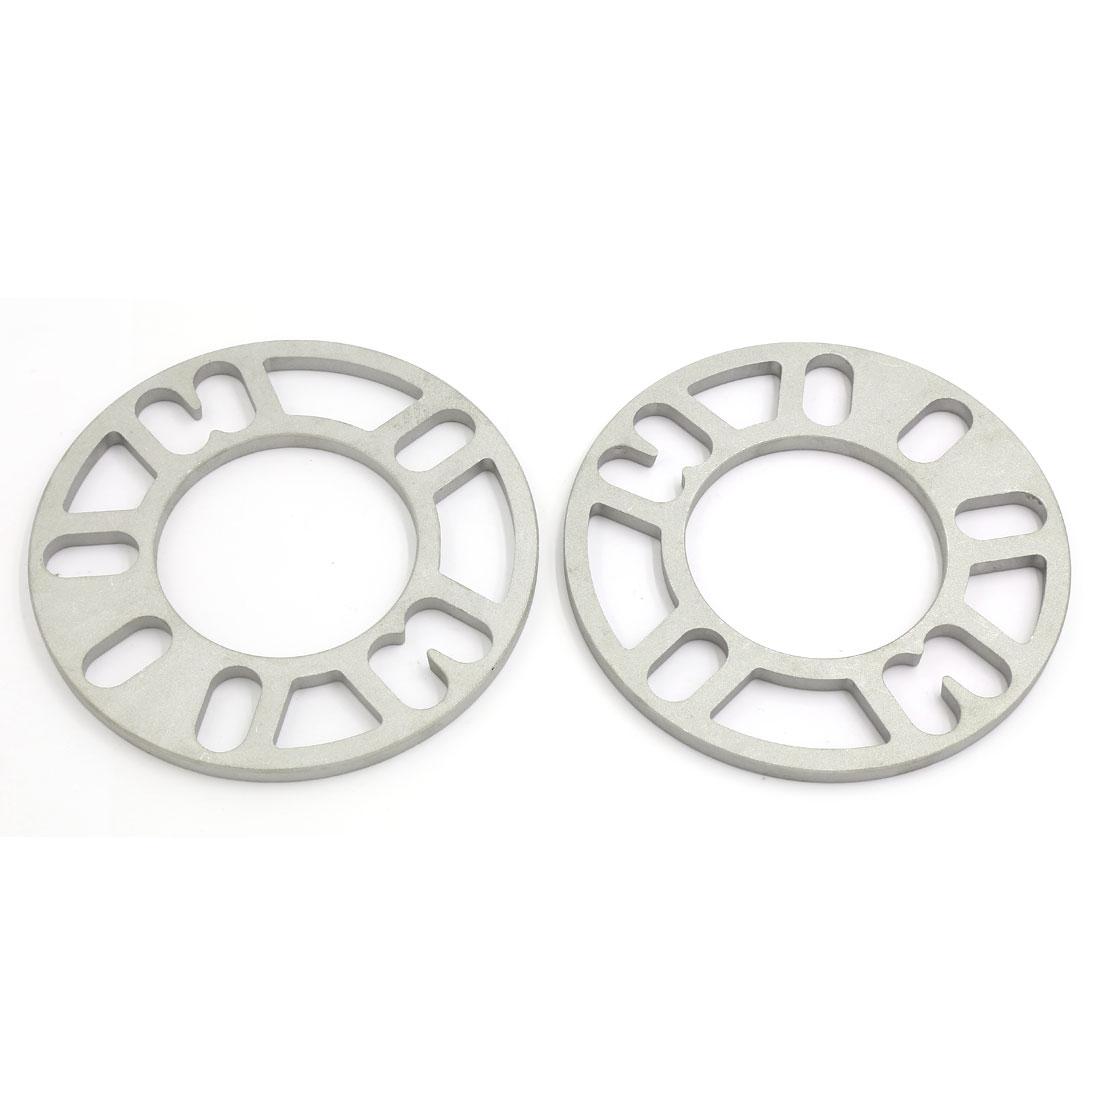 2 Pcs 76mm Center Hole Dia 8mm Thickness Auto Car Wheel Rim Spacer Gasket Sliver Tone